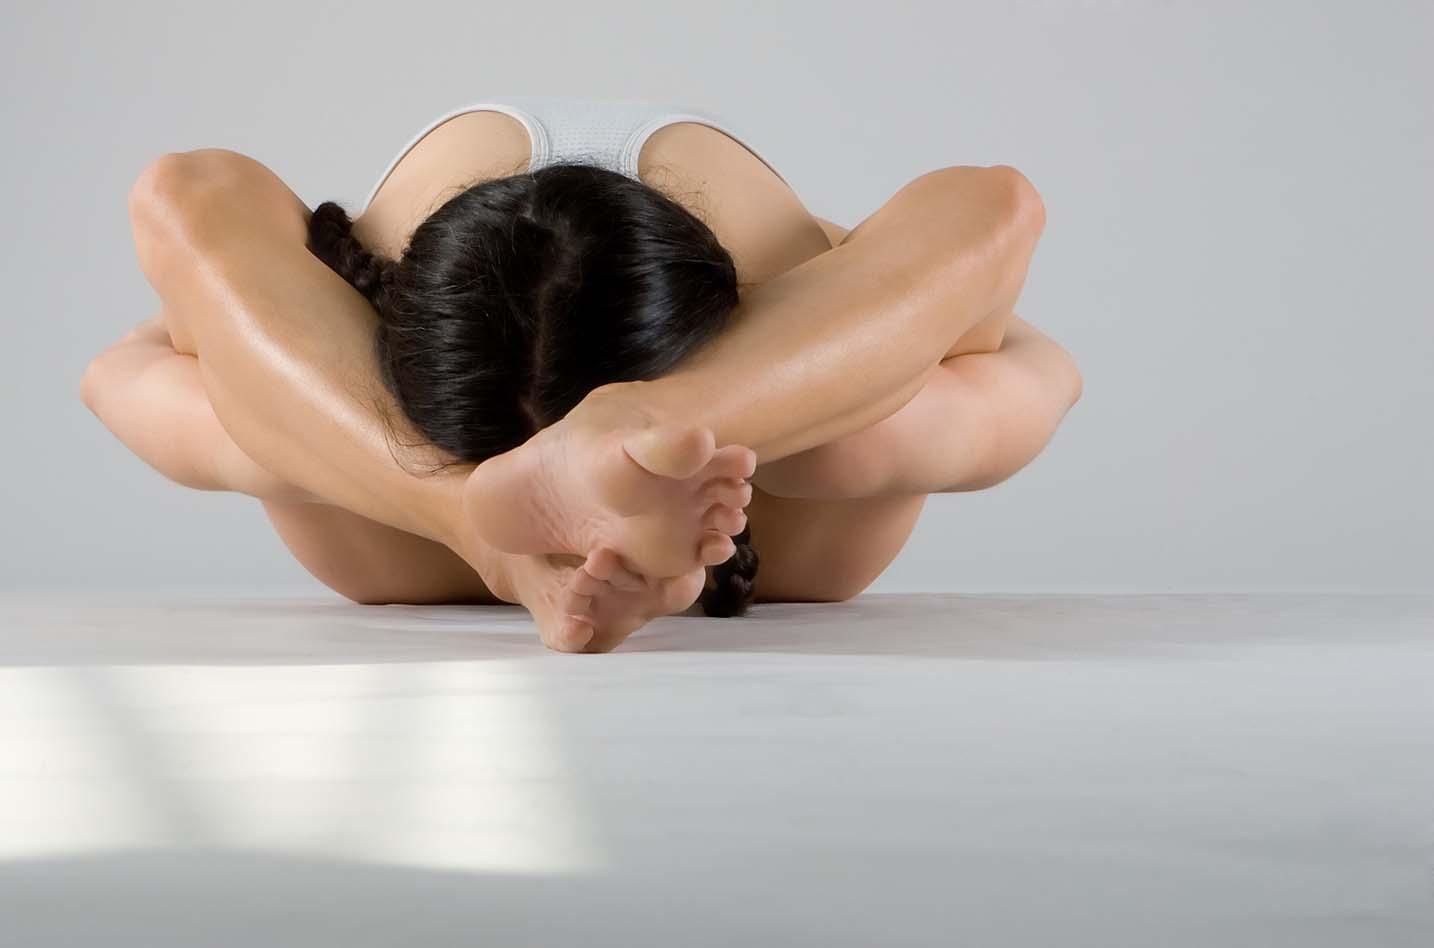 Female Olympia Legs Behind Head 3